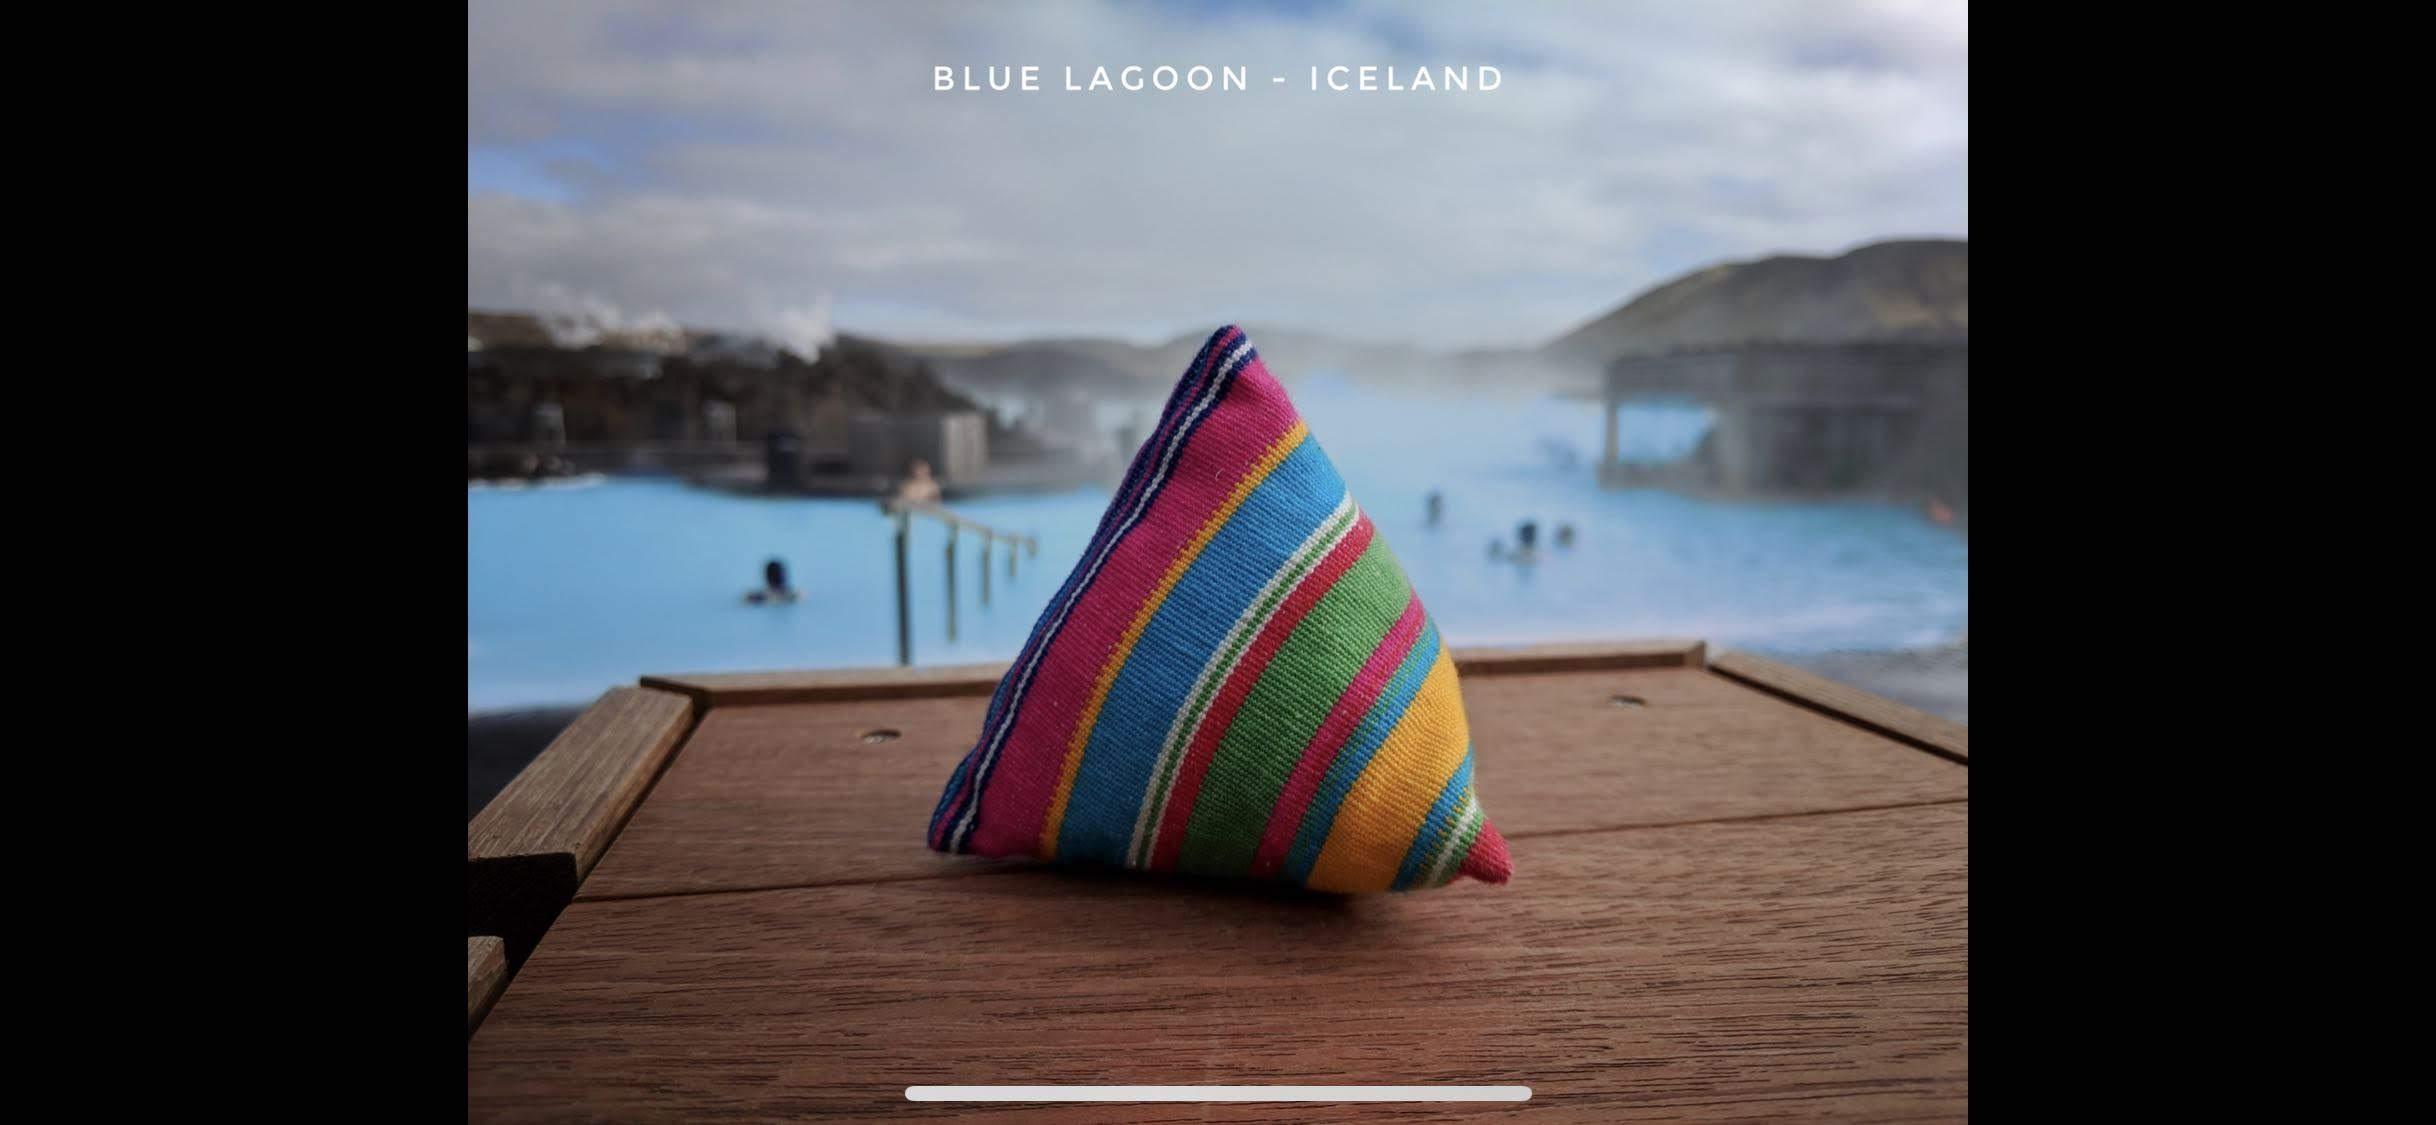 BabyBean in Iceland